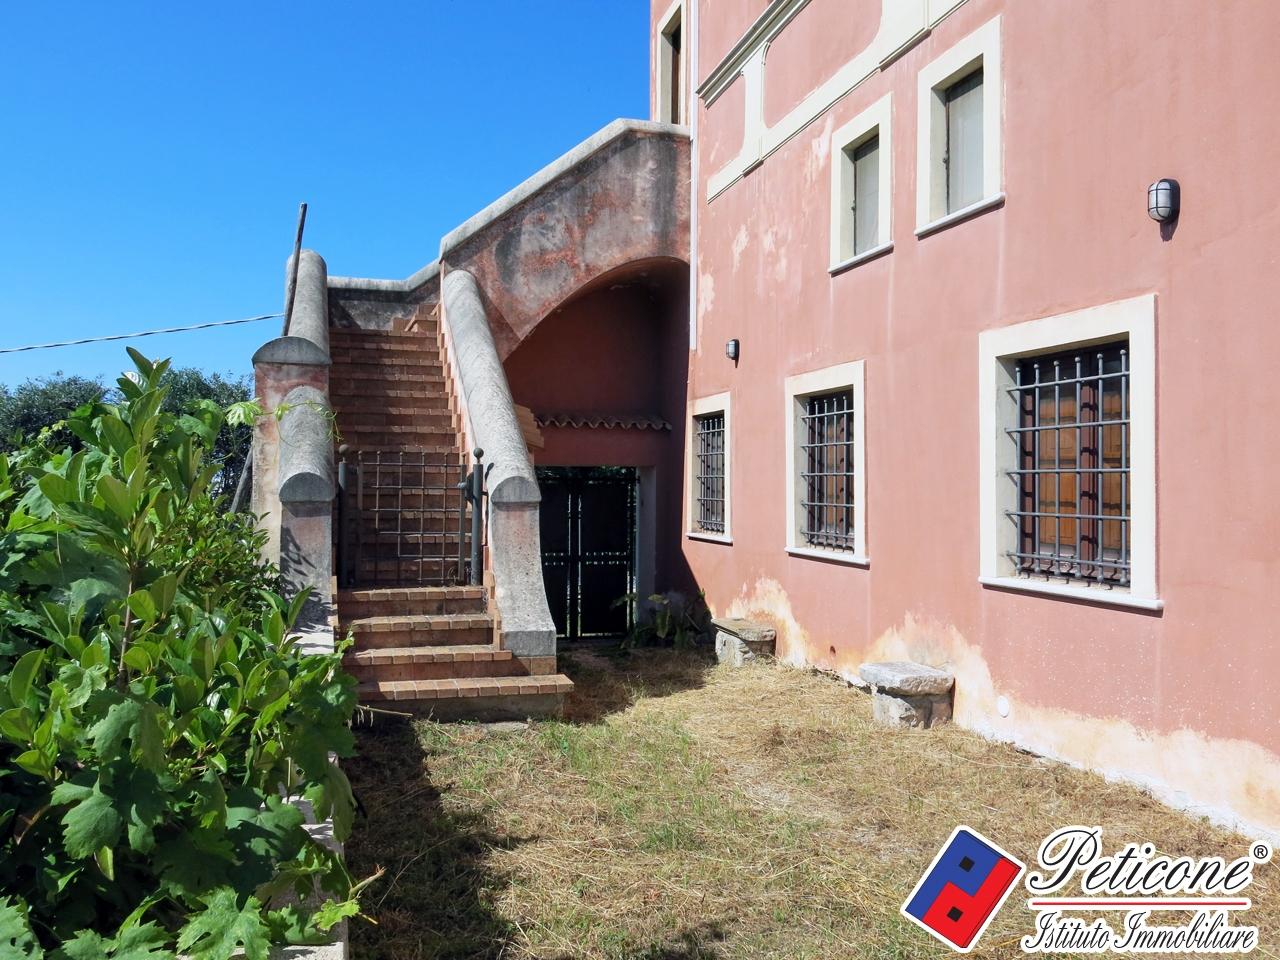 Villa in Vendita a Gaeta: 5 locali, 250 mq - Foto 3